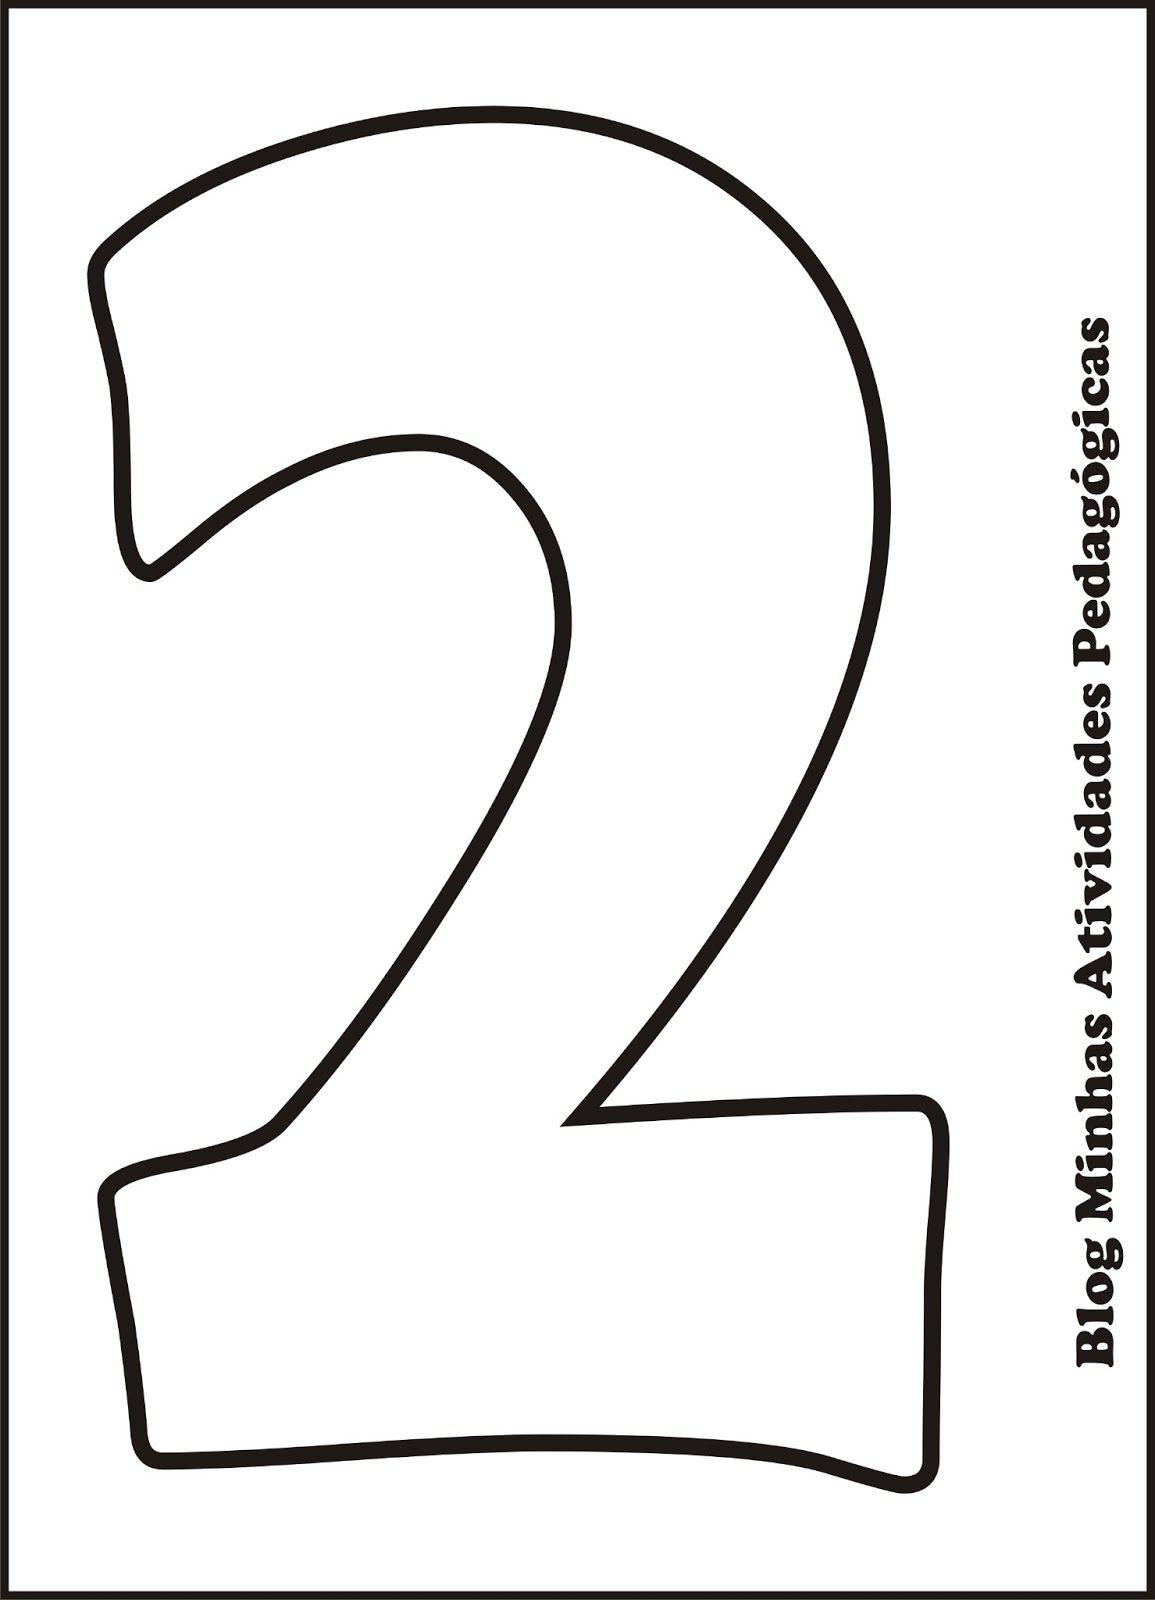 Moldes De Numeros Para Imprimir | uno | Pinterest